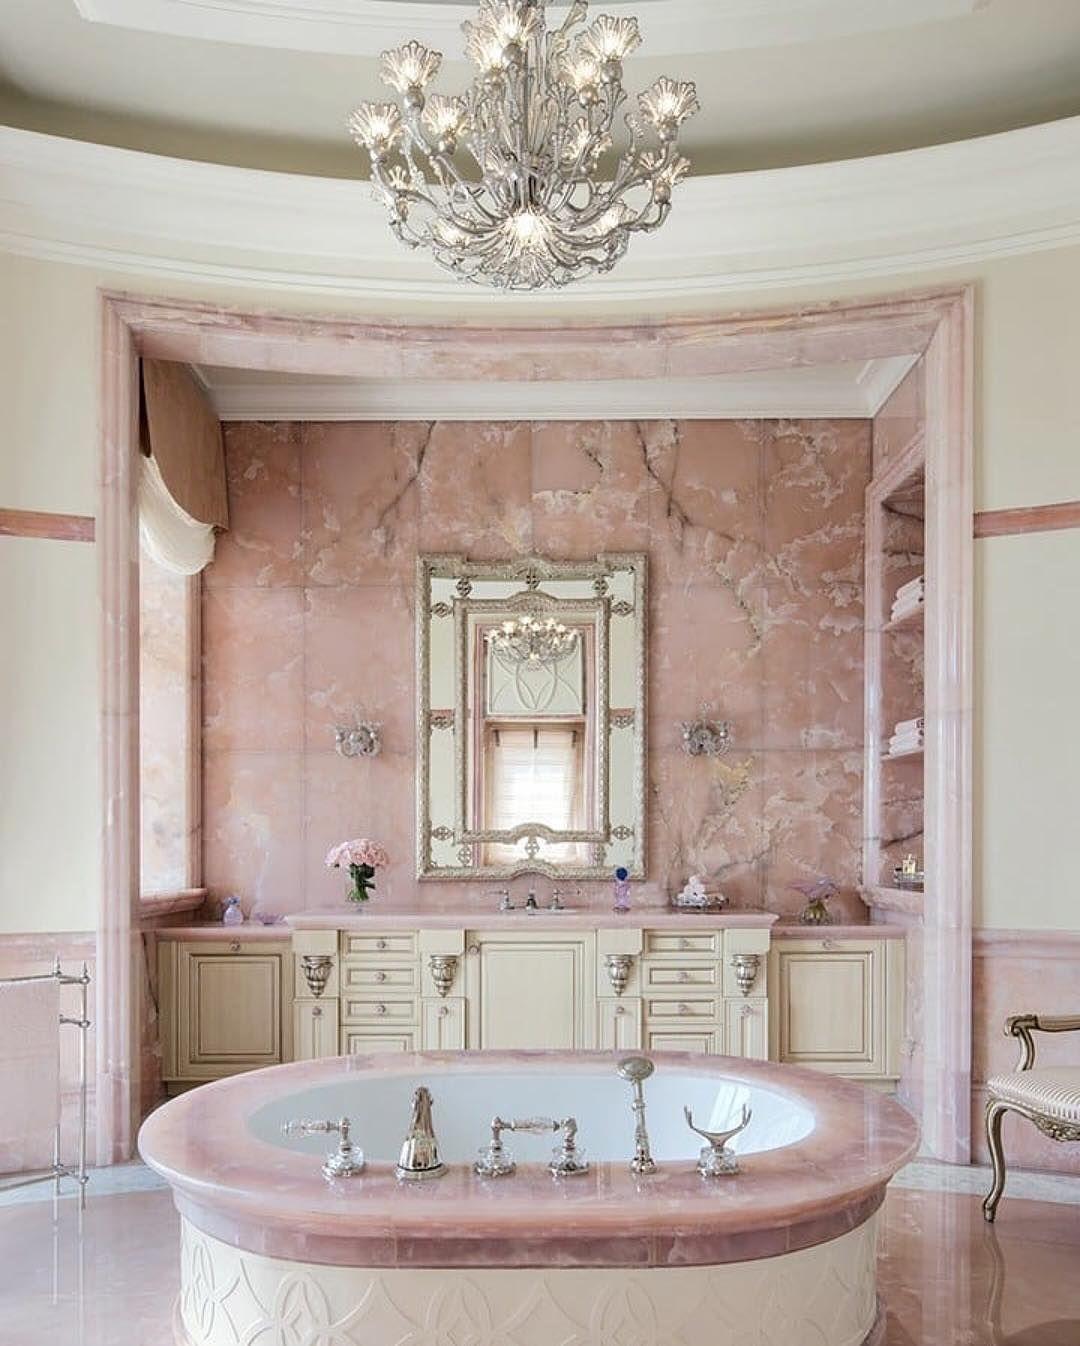 Ooh La La Paris Theme Bathroom Pink Bathroom Decor Paris